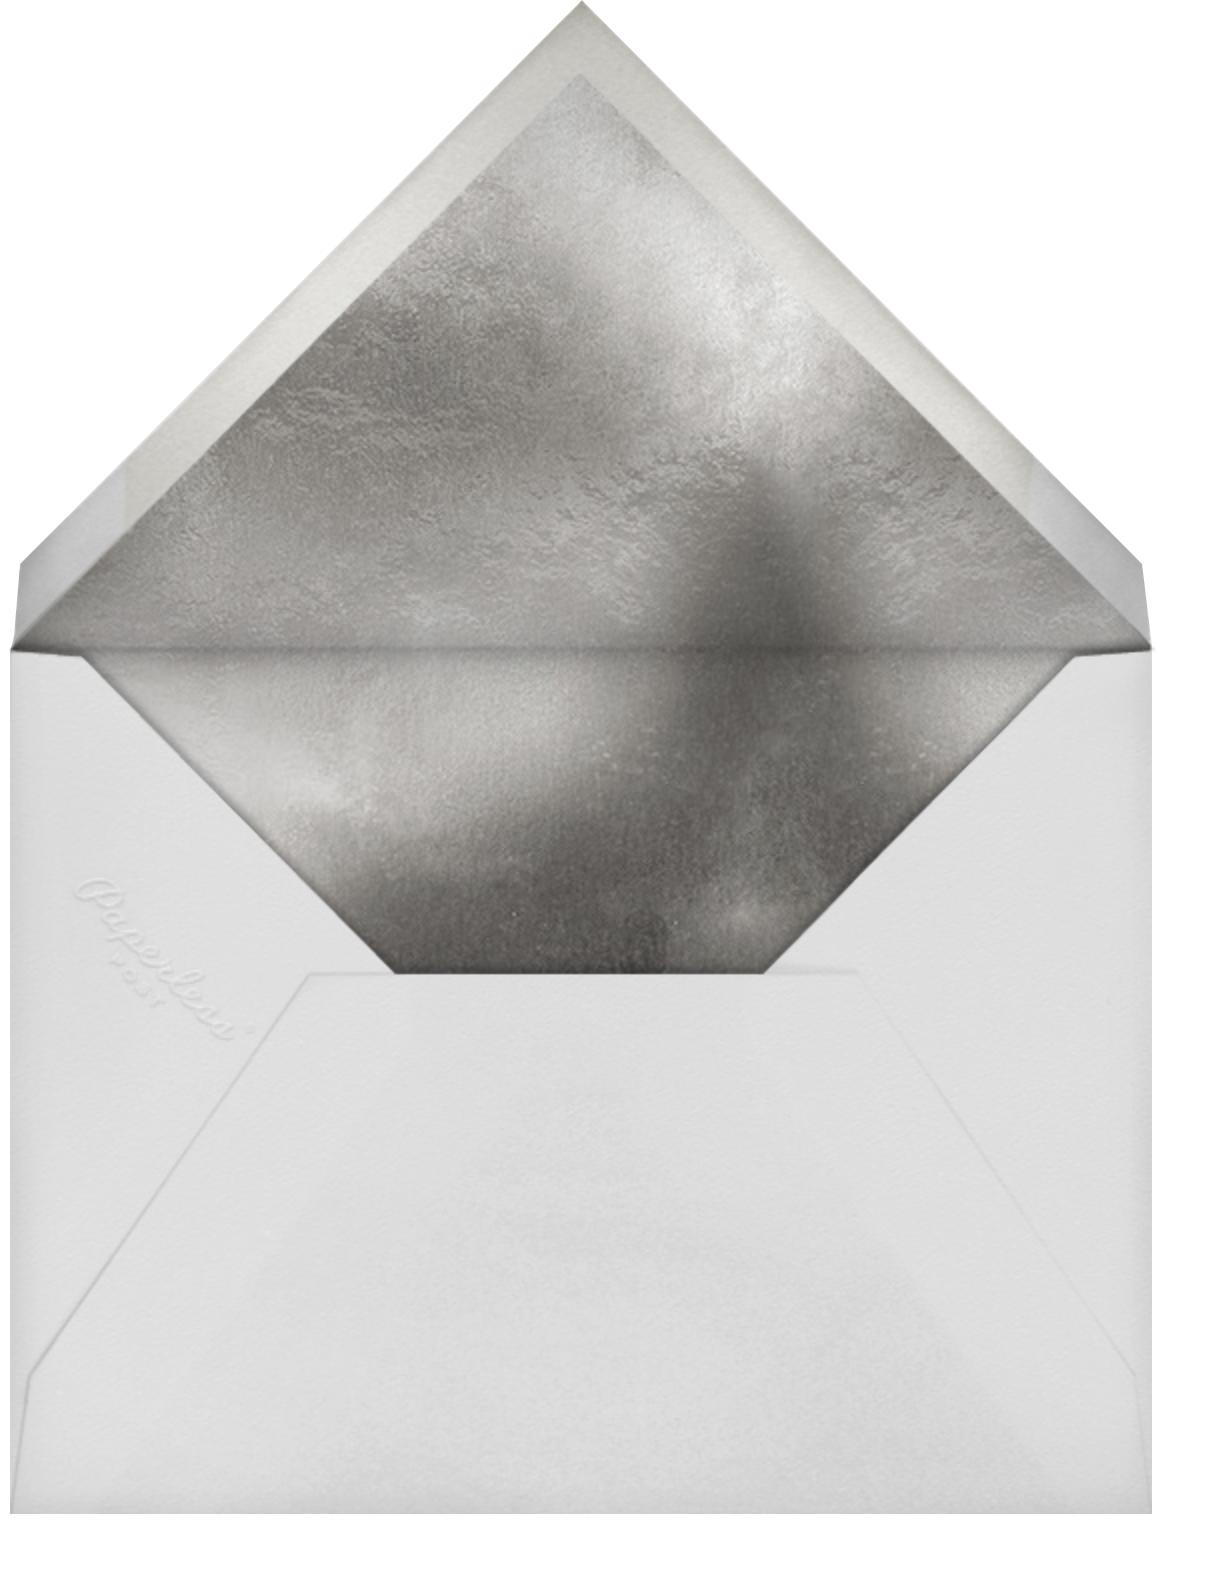 Delano - Jonathan Adler - Bar and bat mitzvah - envelope back